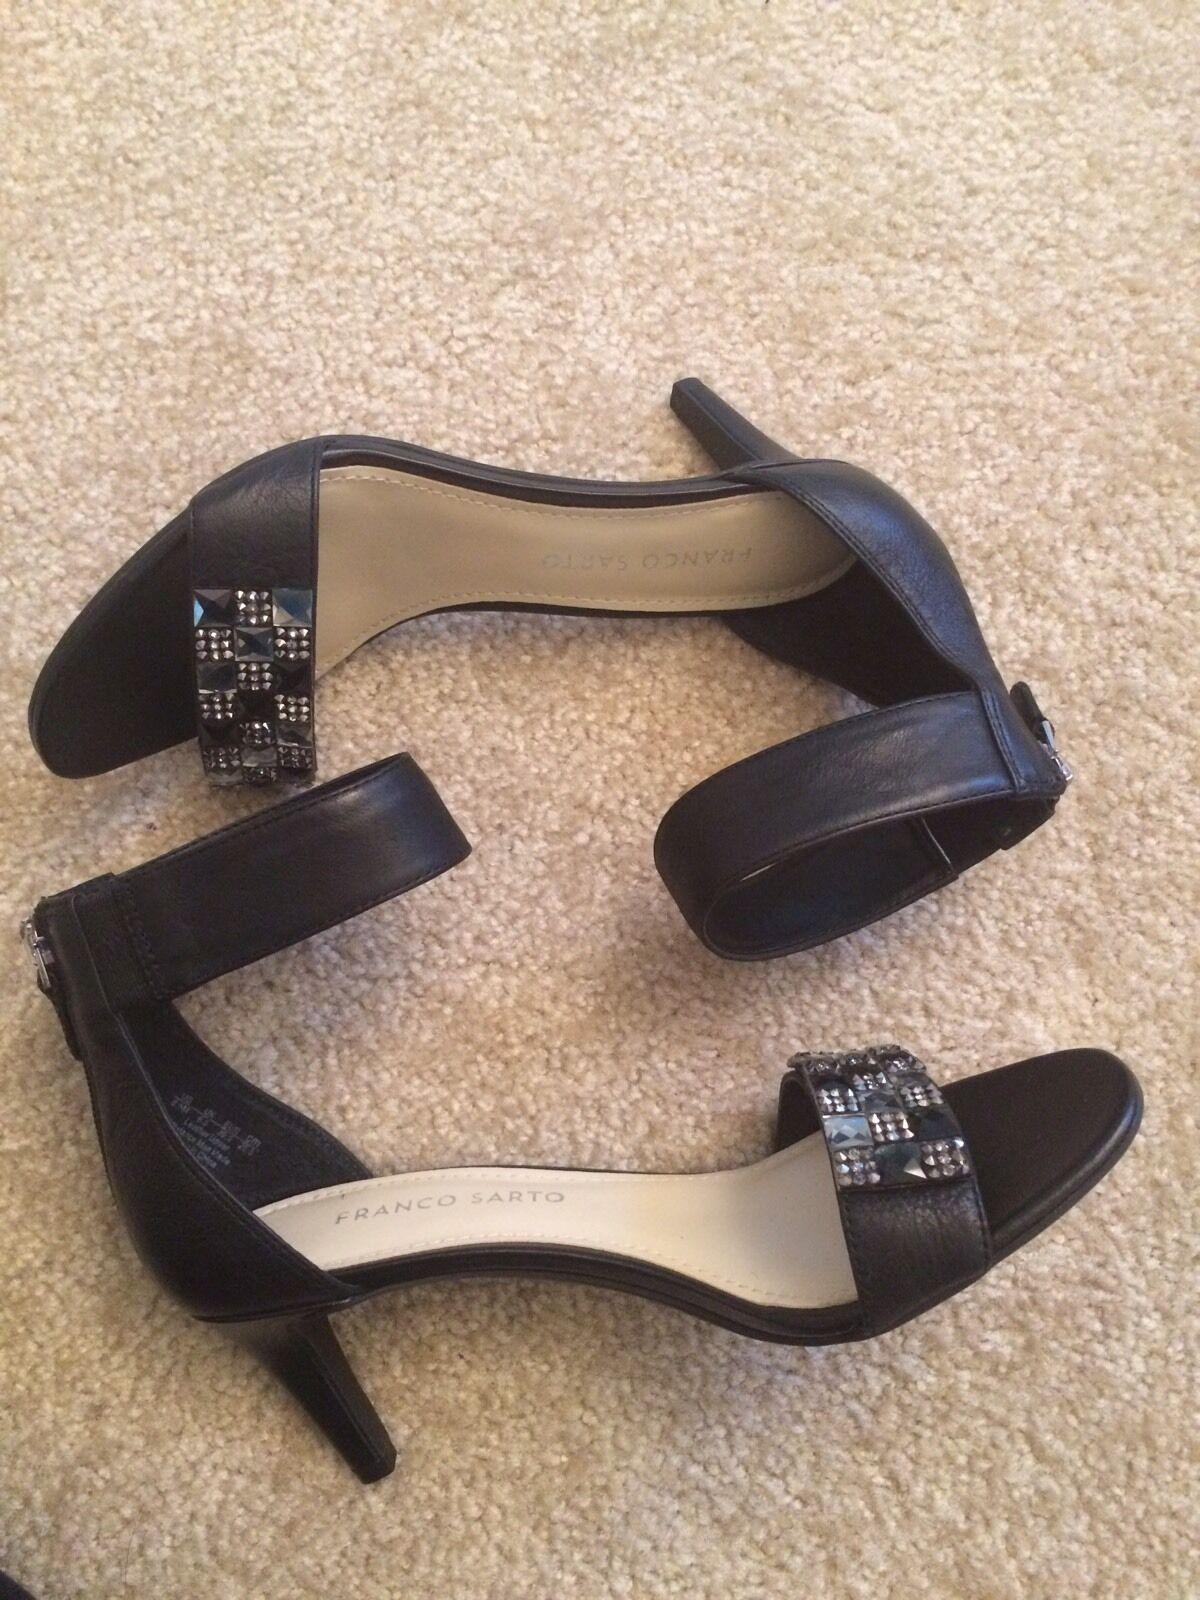 NEW Franco Sarto Black Embellished Embellished Embellished Evening Sandals Open-toe Sexy Bling Size 8.5 1beeb3